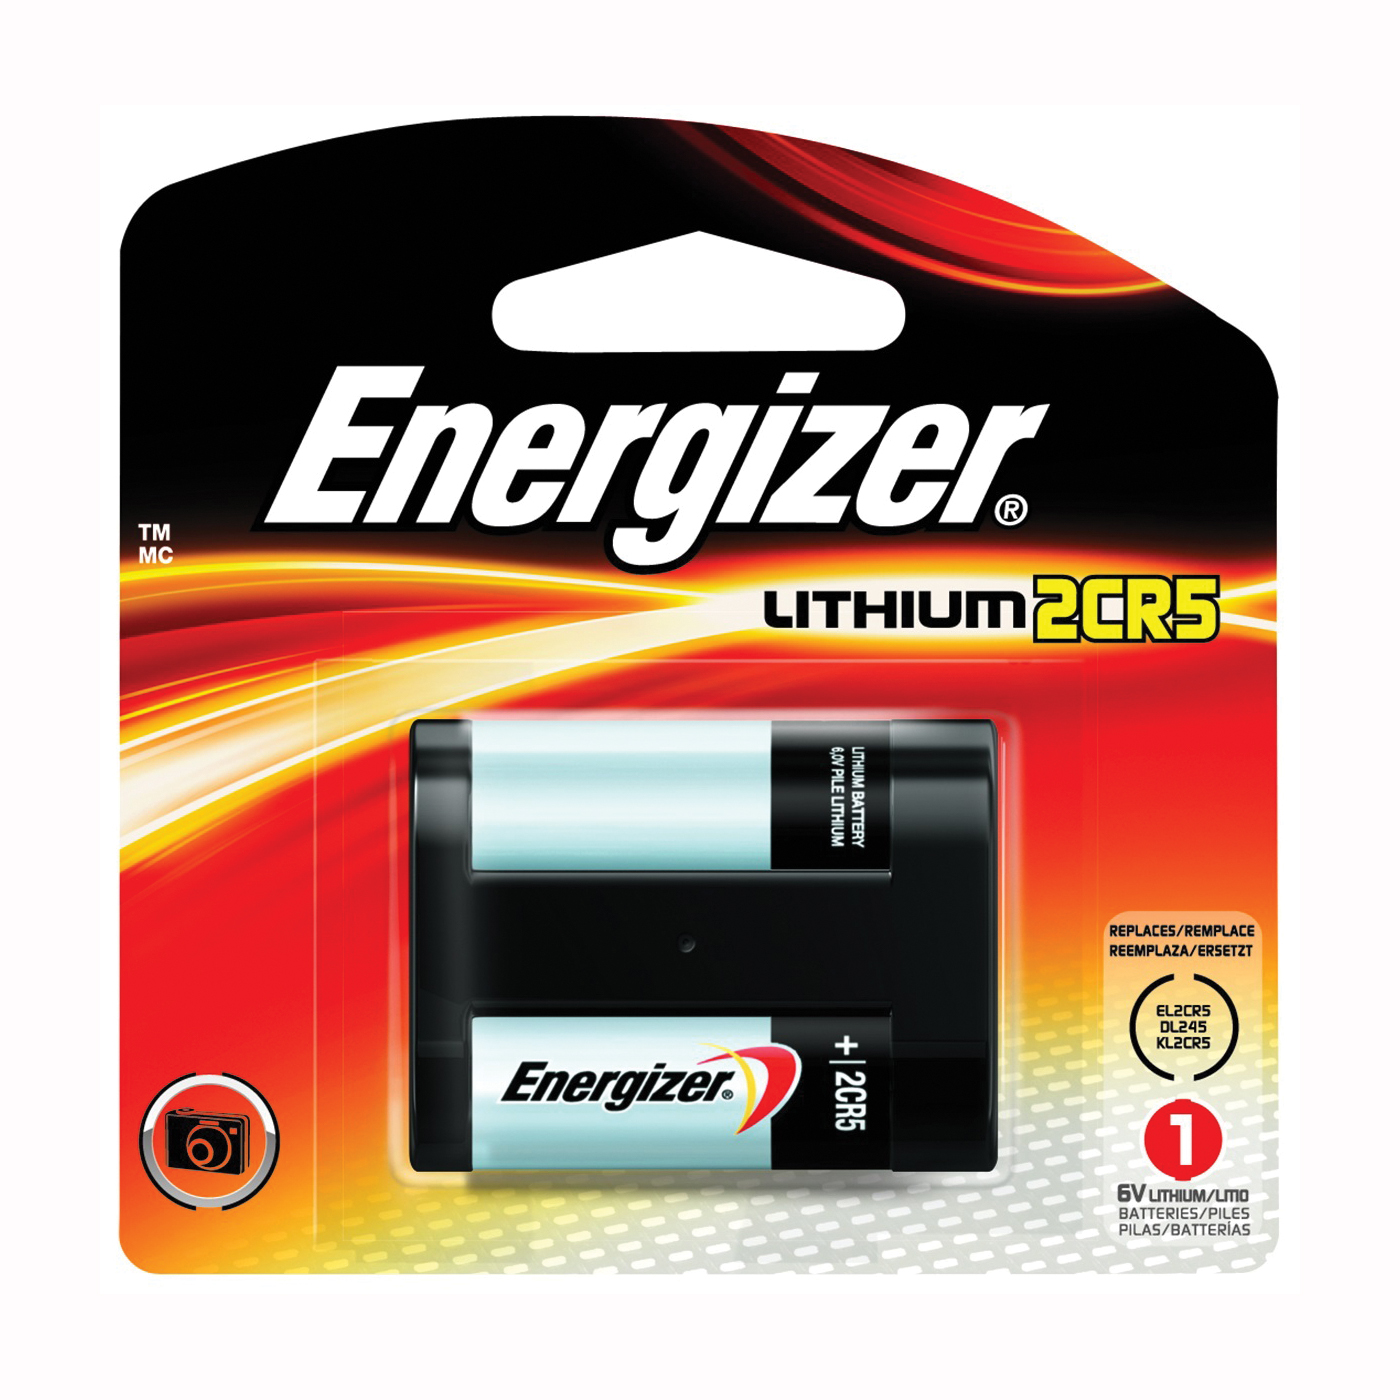 Picture of Energizer EL2CR5 Series EL2CR5BP Lithium Battery, 6 V Battery, 1500 mAh, Lithium, Manganese Dioxide